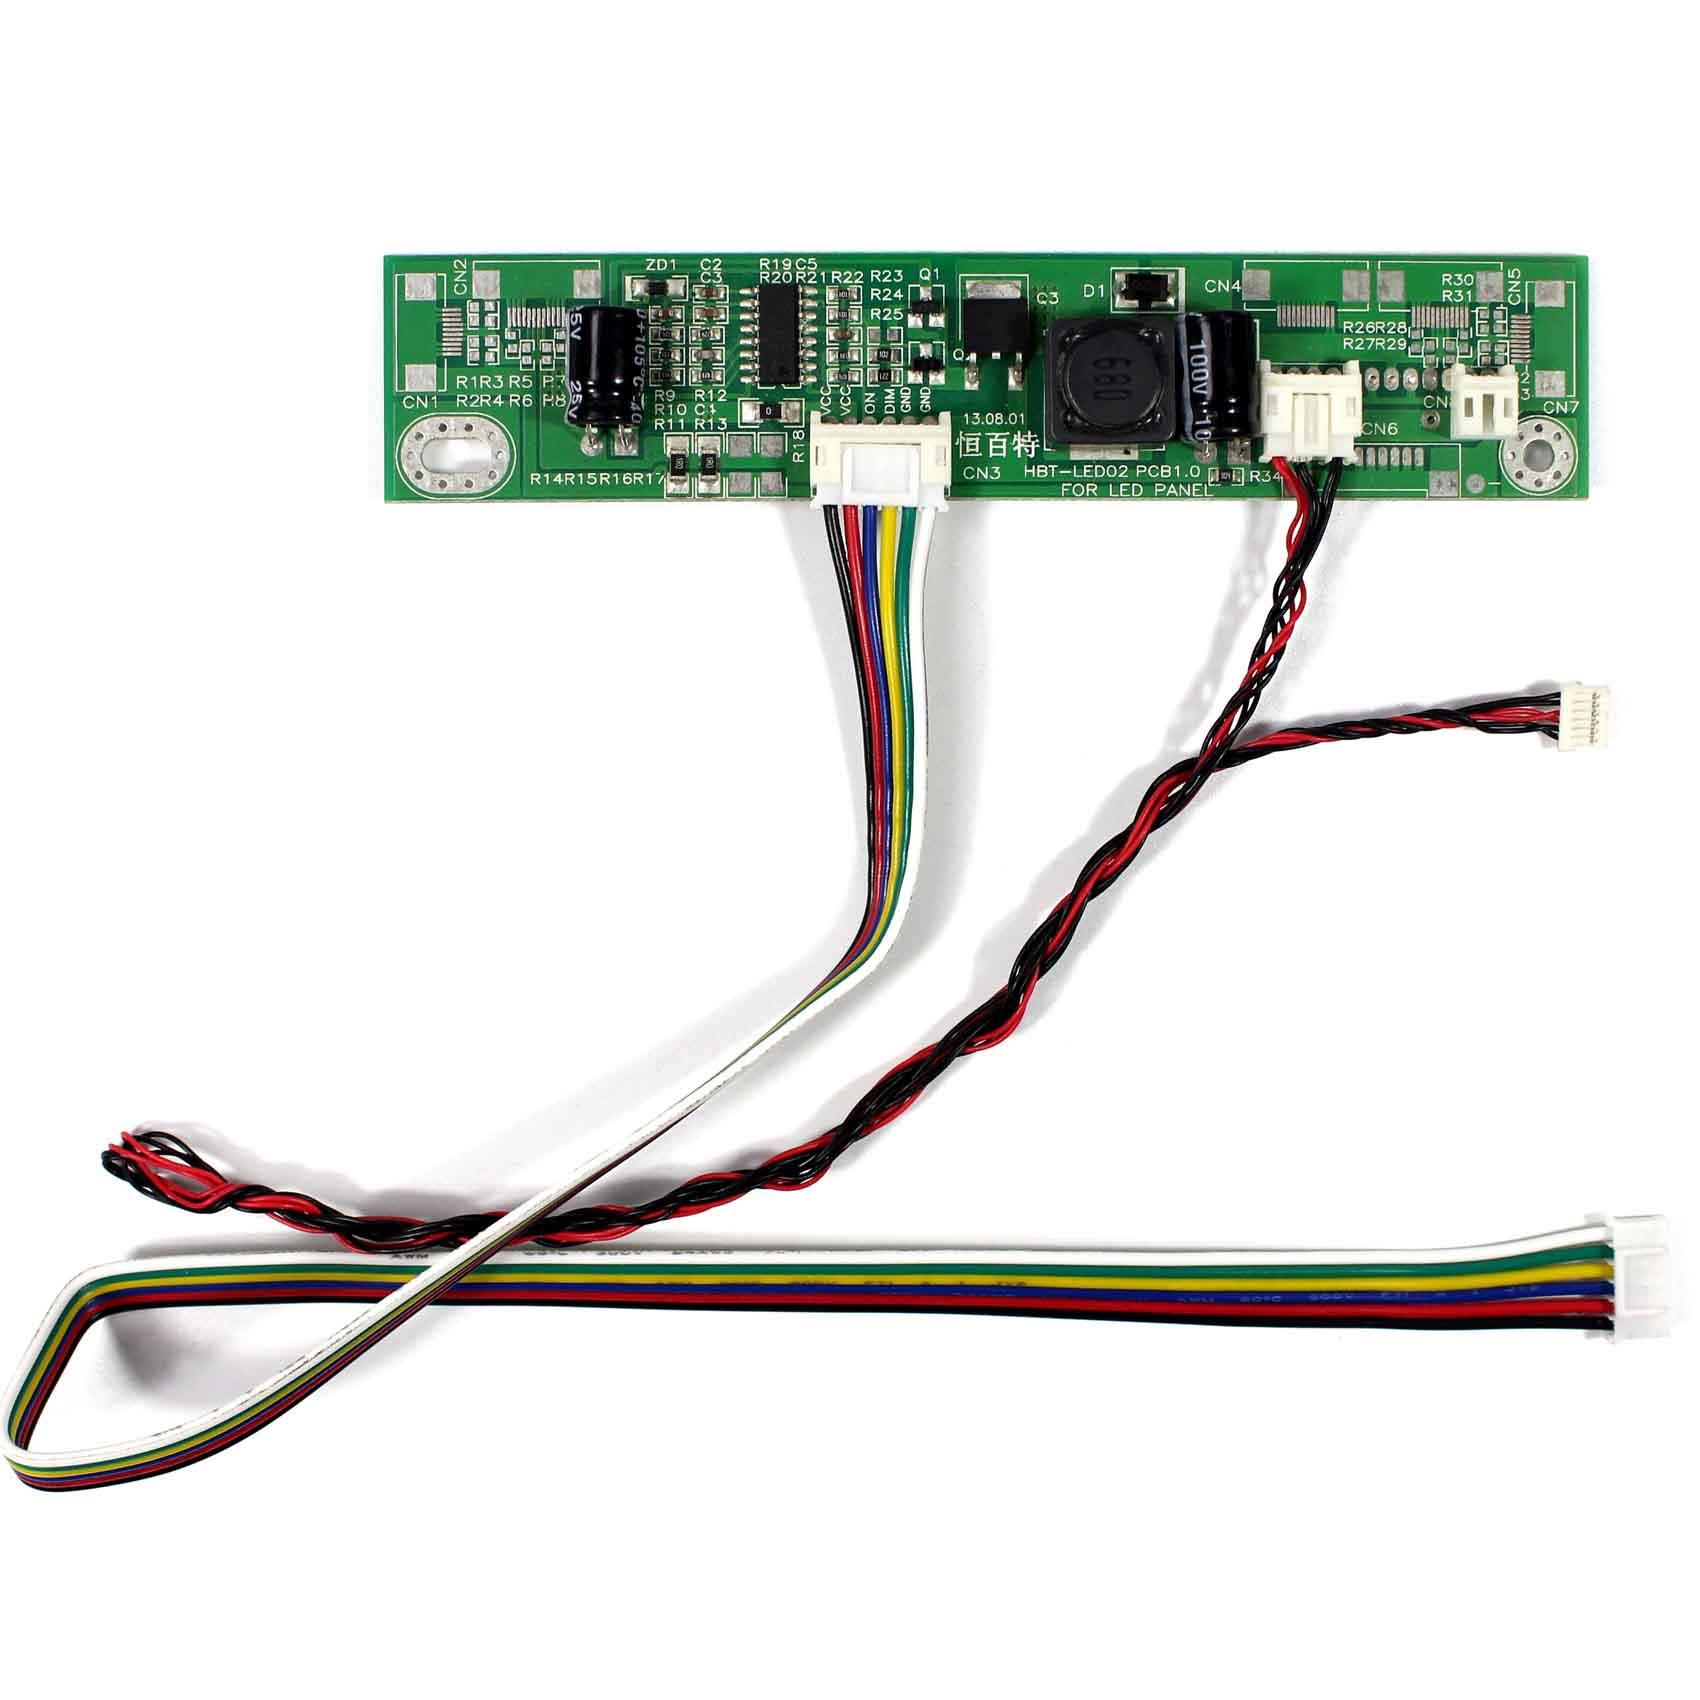 LED Inverter Board Für LTM185AT04 M270HW02 M215HW01 VB M185BGE-L22 LCD VS632B-1